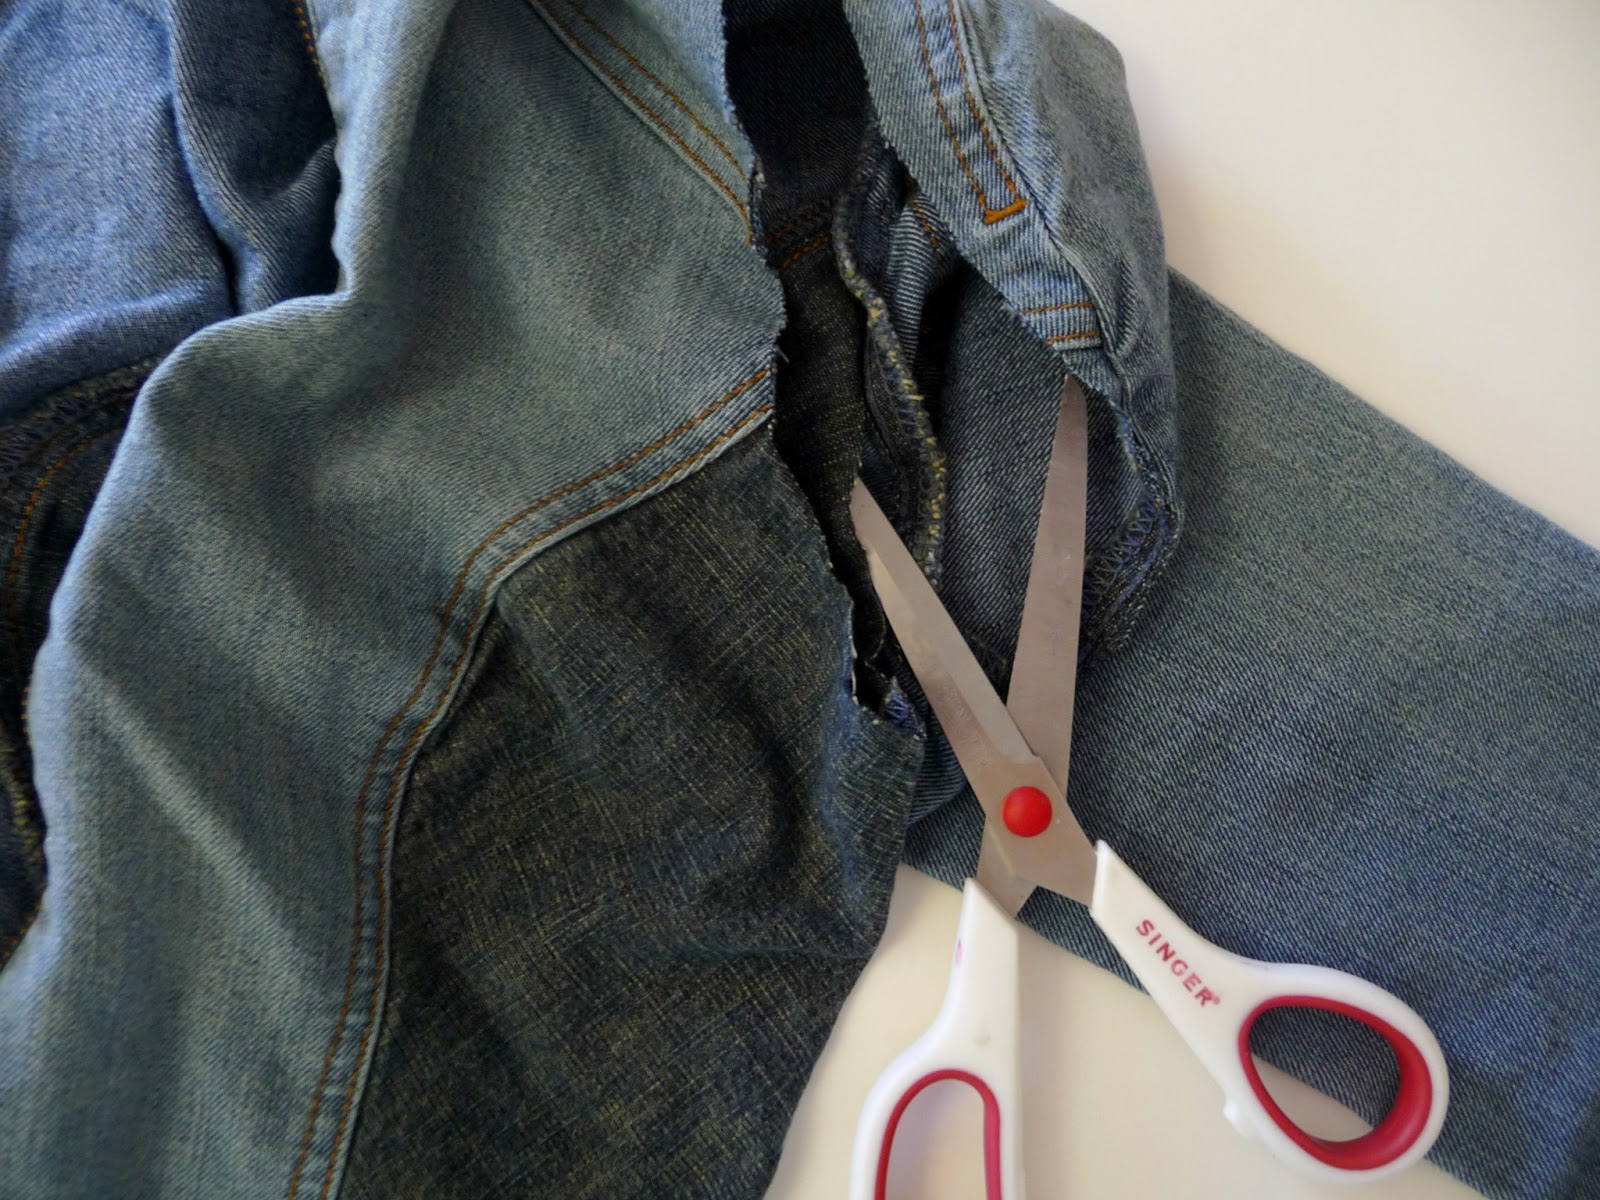 DIY denim vest refashion